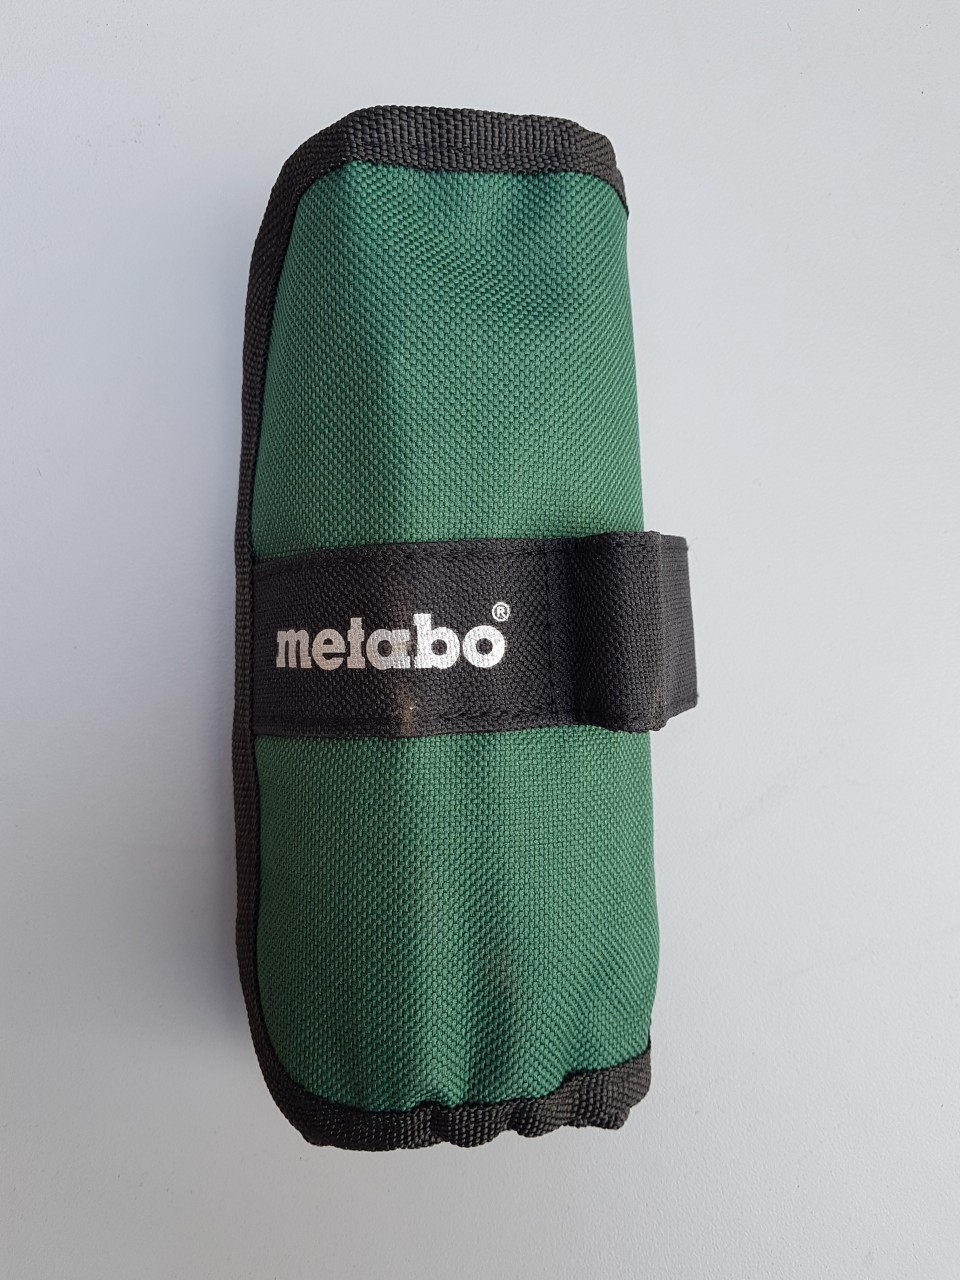 Metabo borenset Metabo borenset